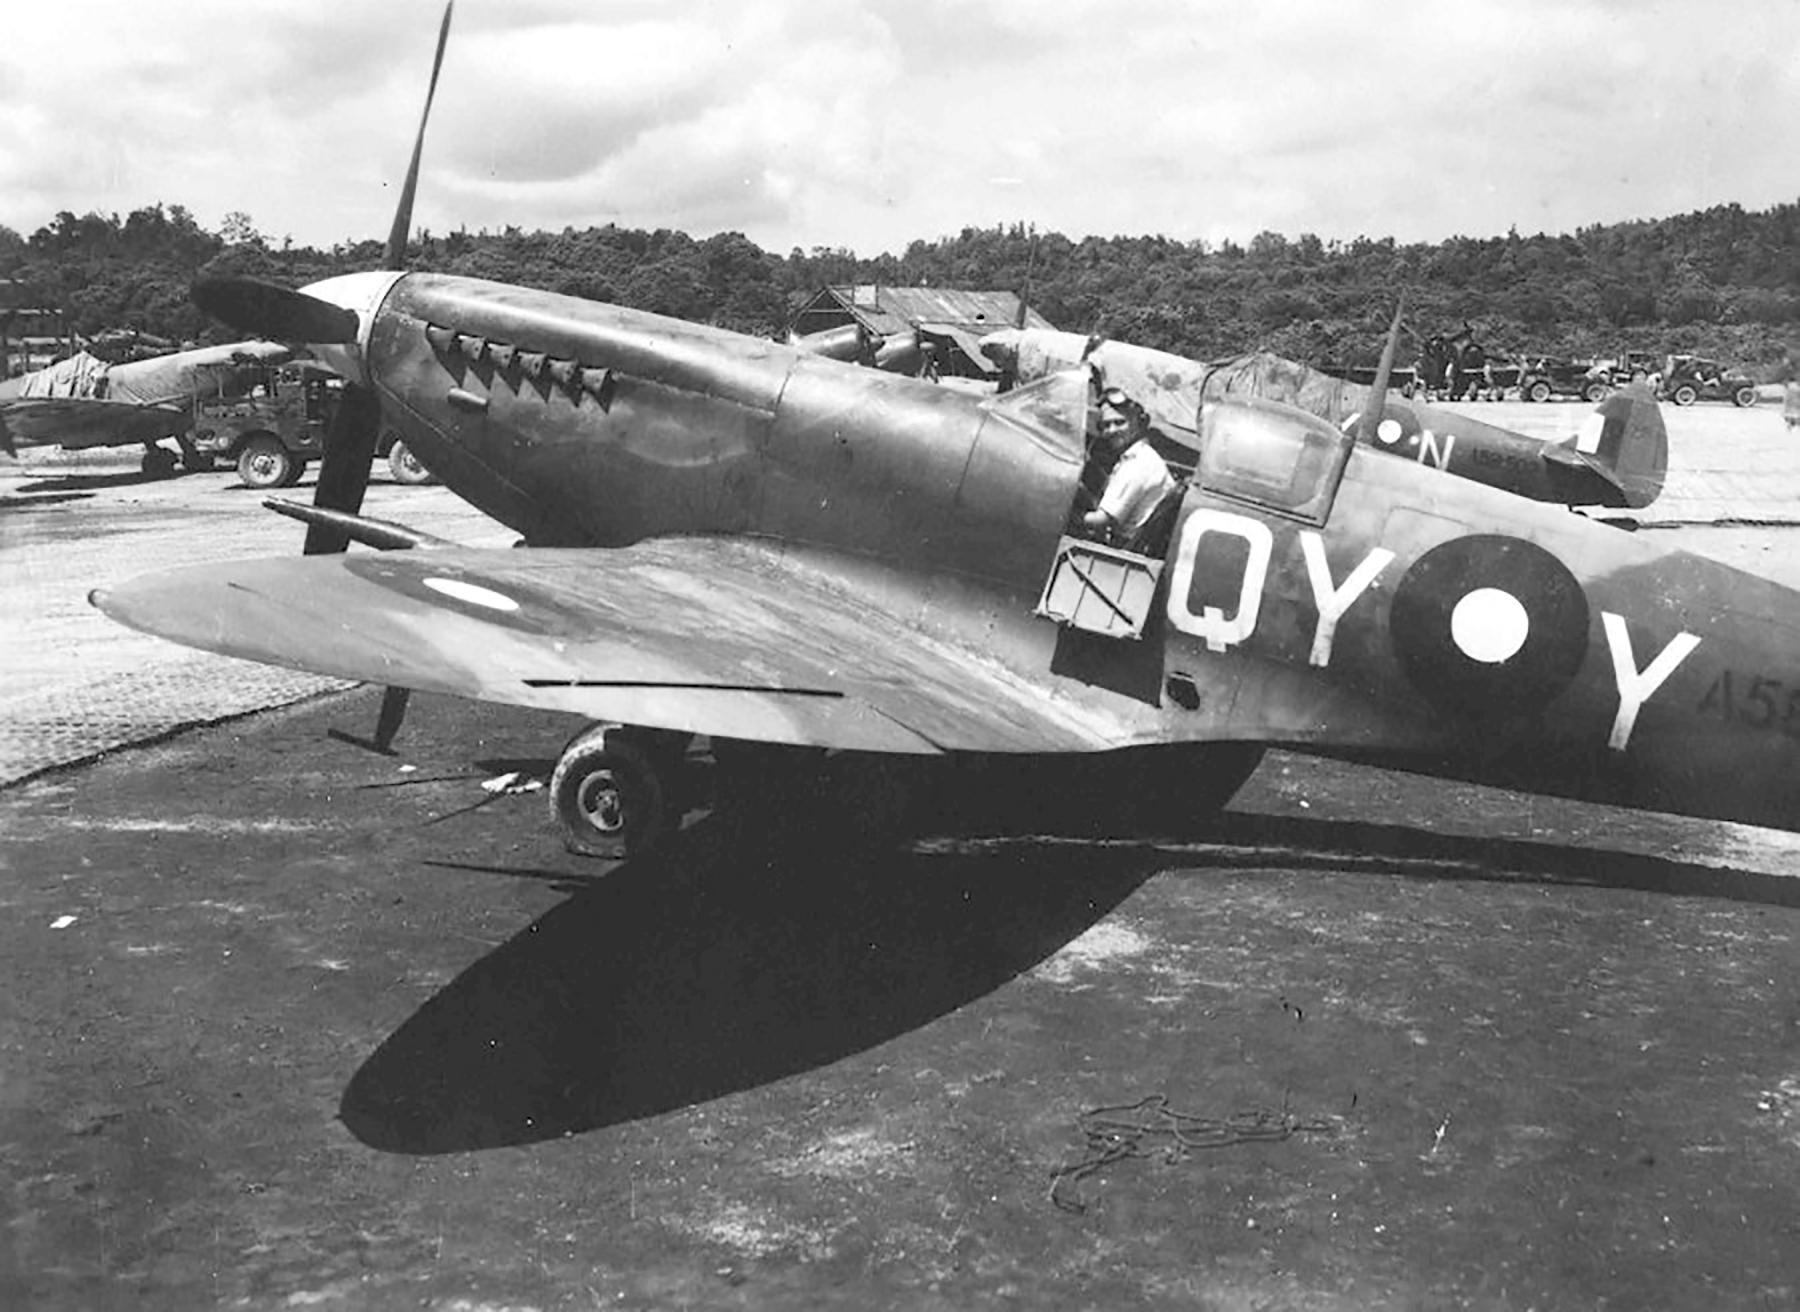 Spitfire QYY A58 xxx and QYN A58 502 01